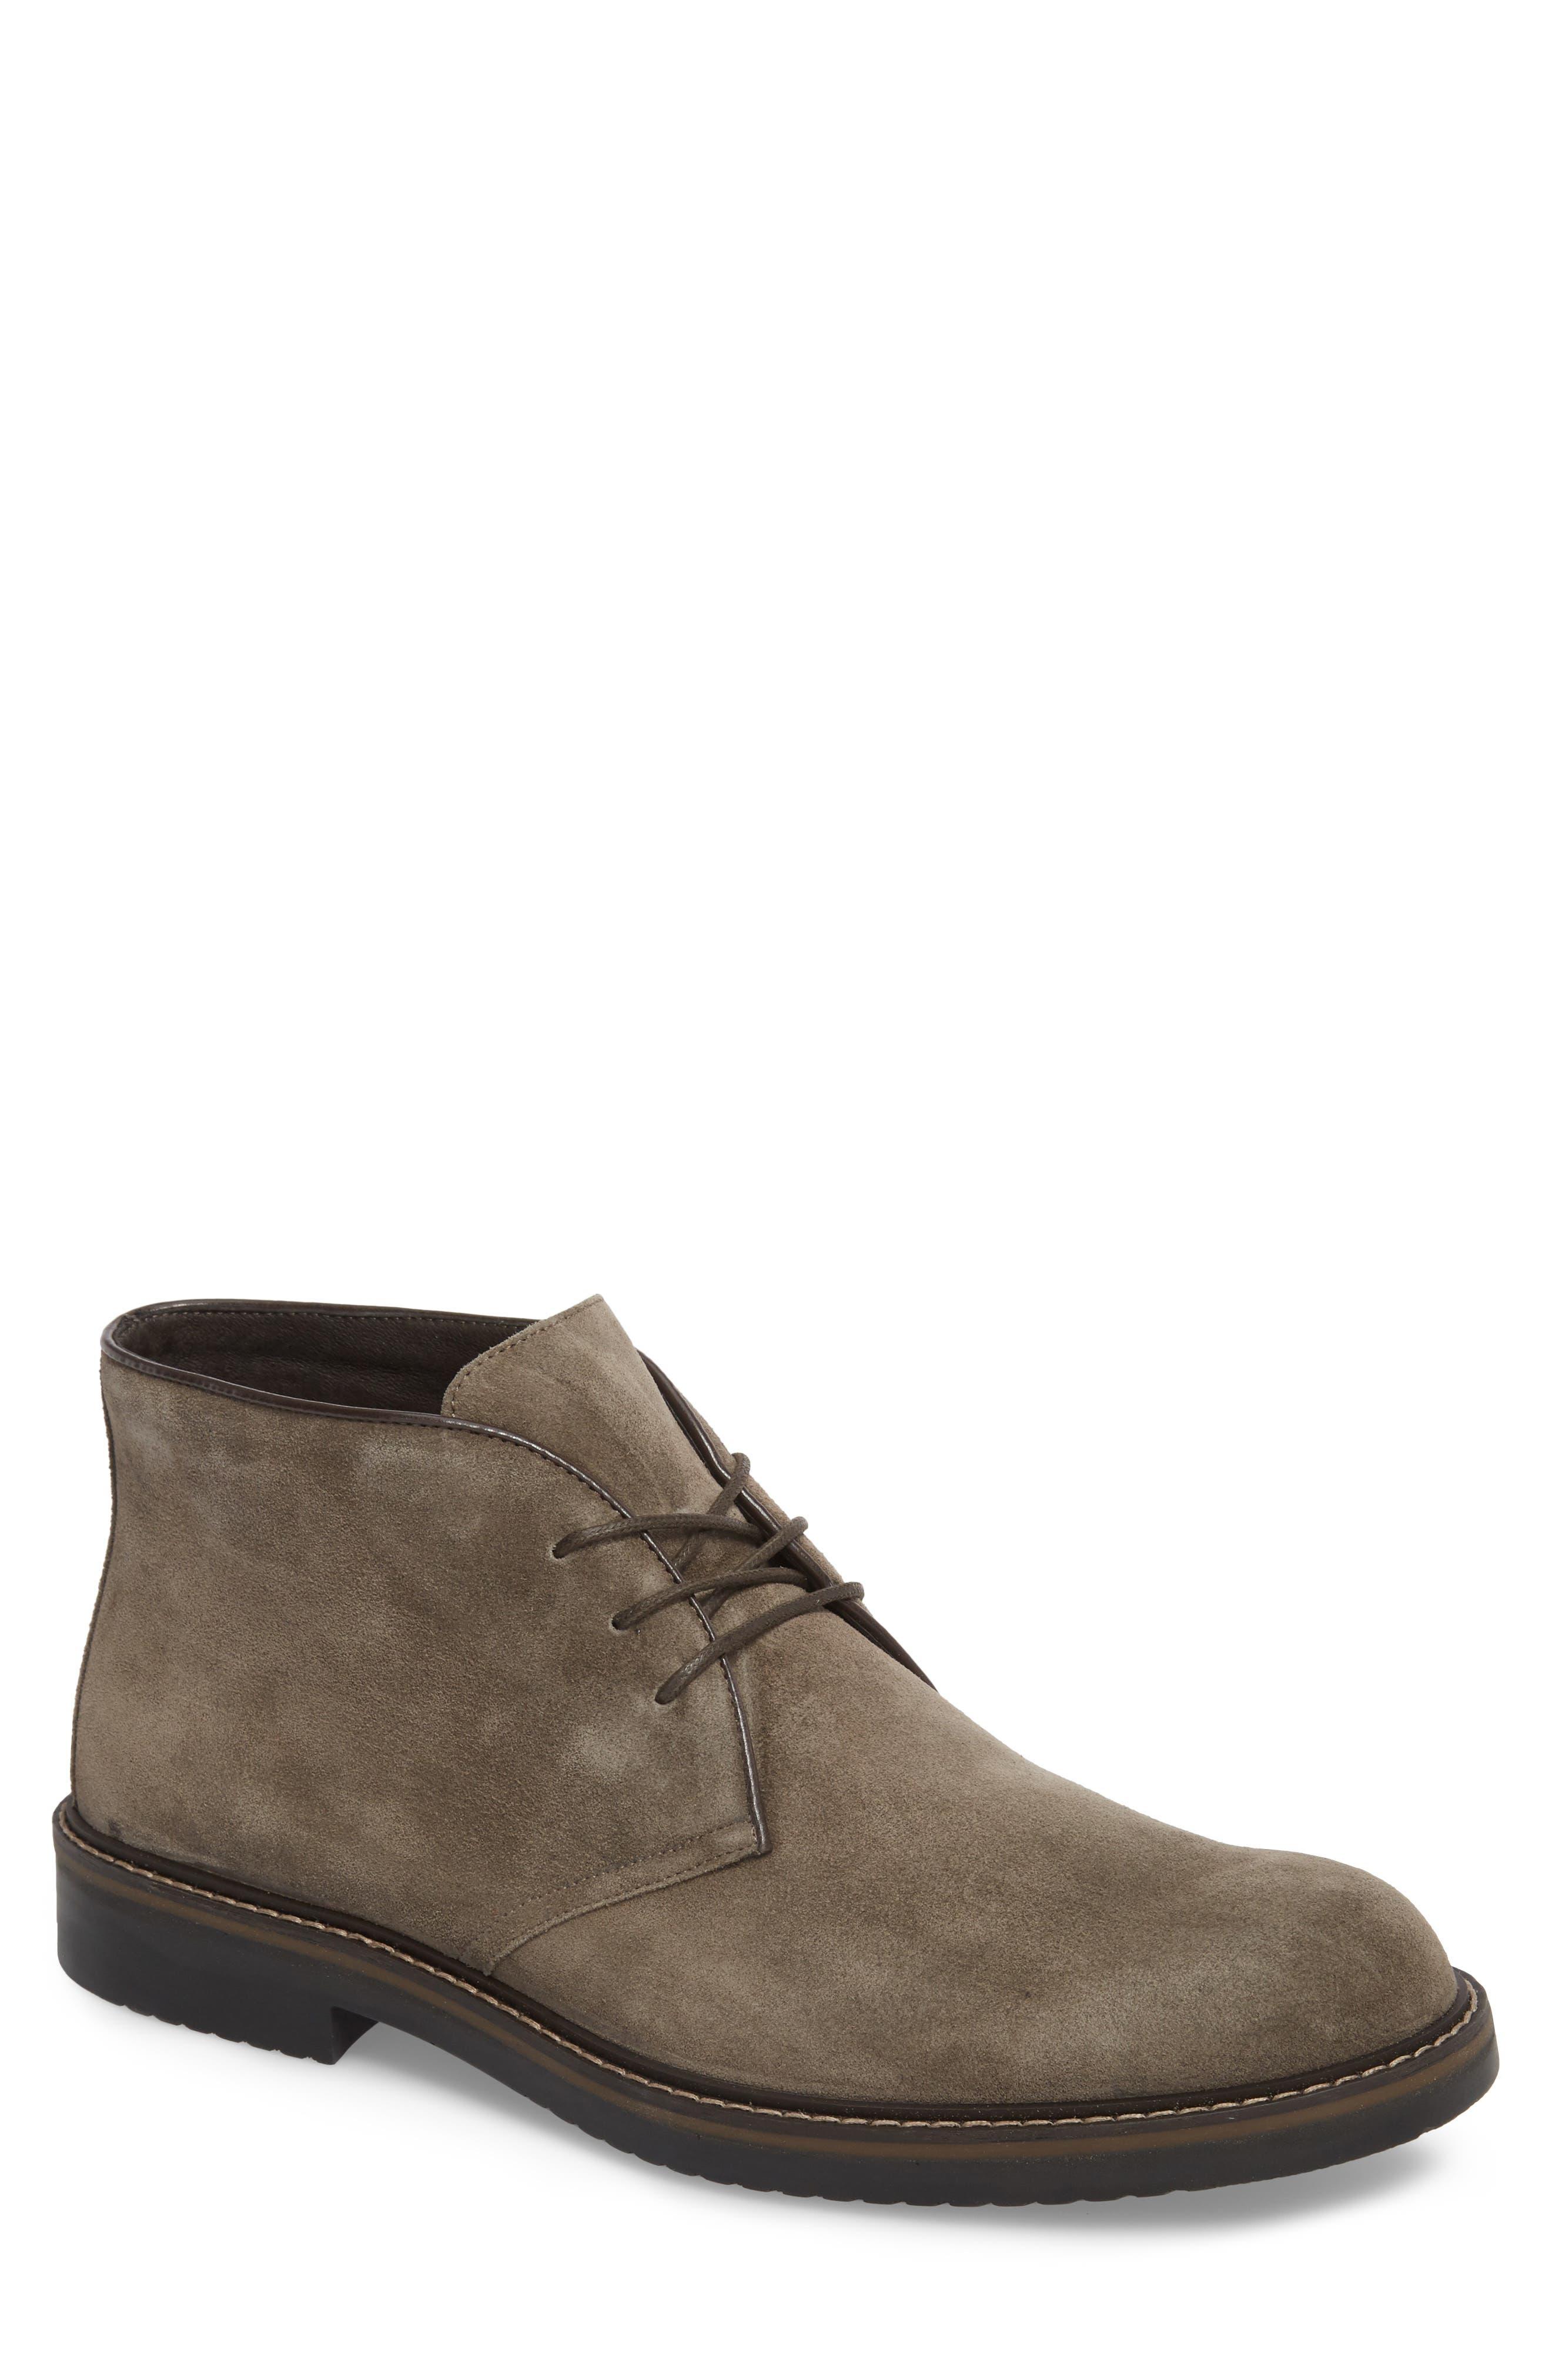 Bradford Chukka Boot,                         Main,                         color, STONE SUEDE